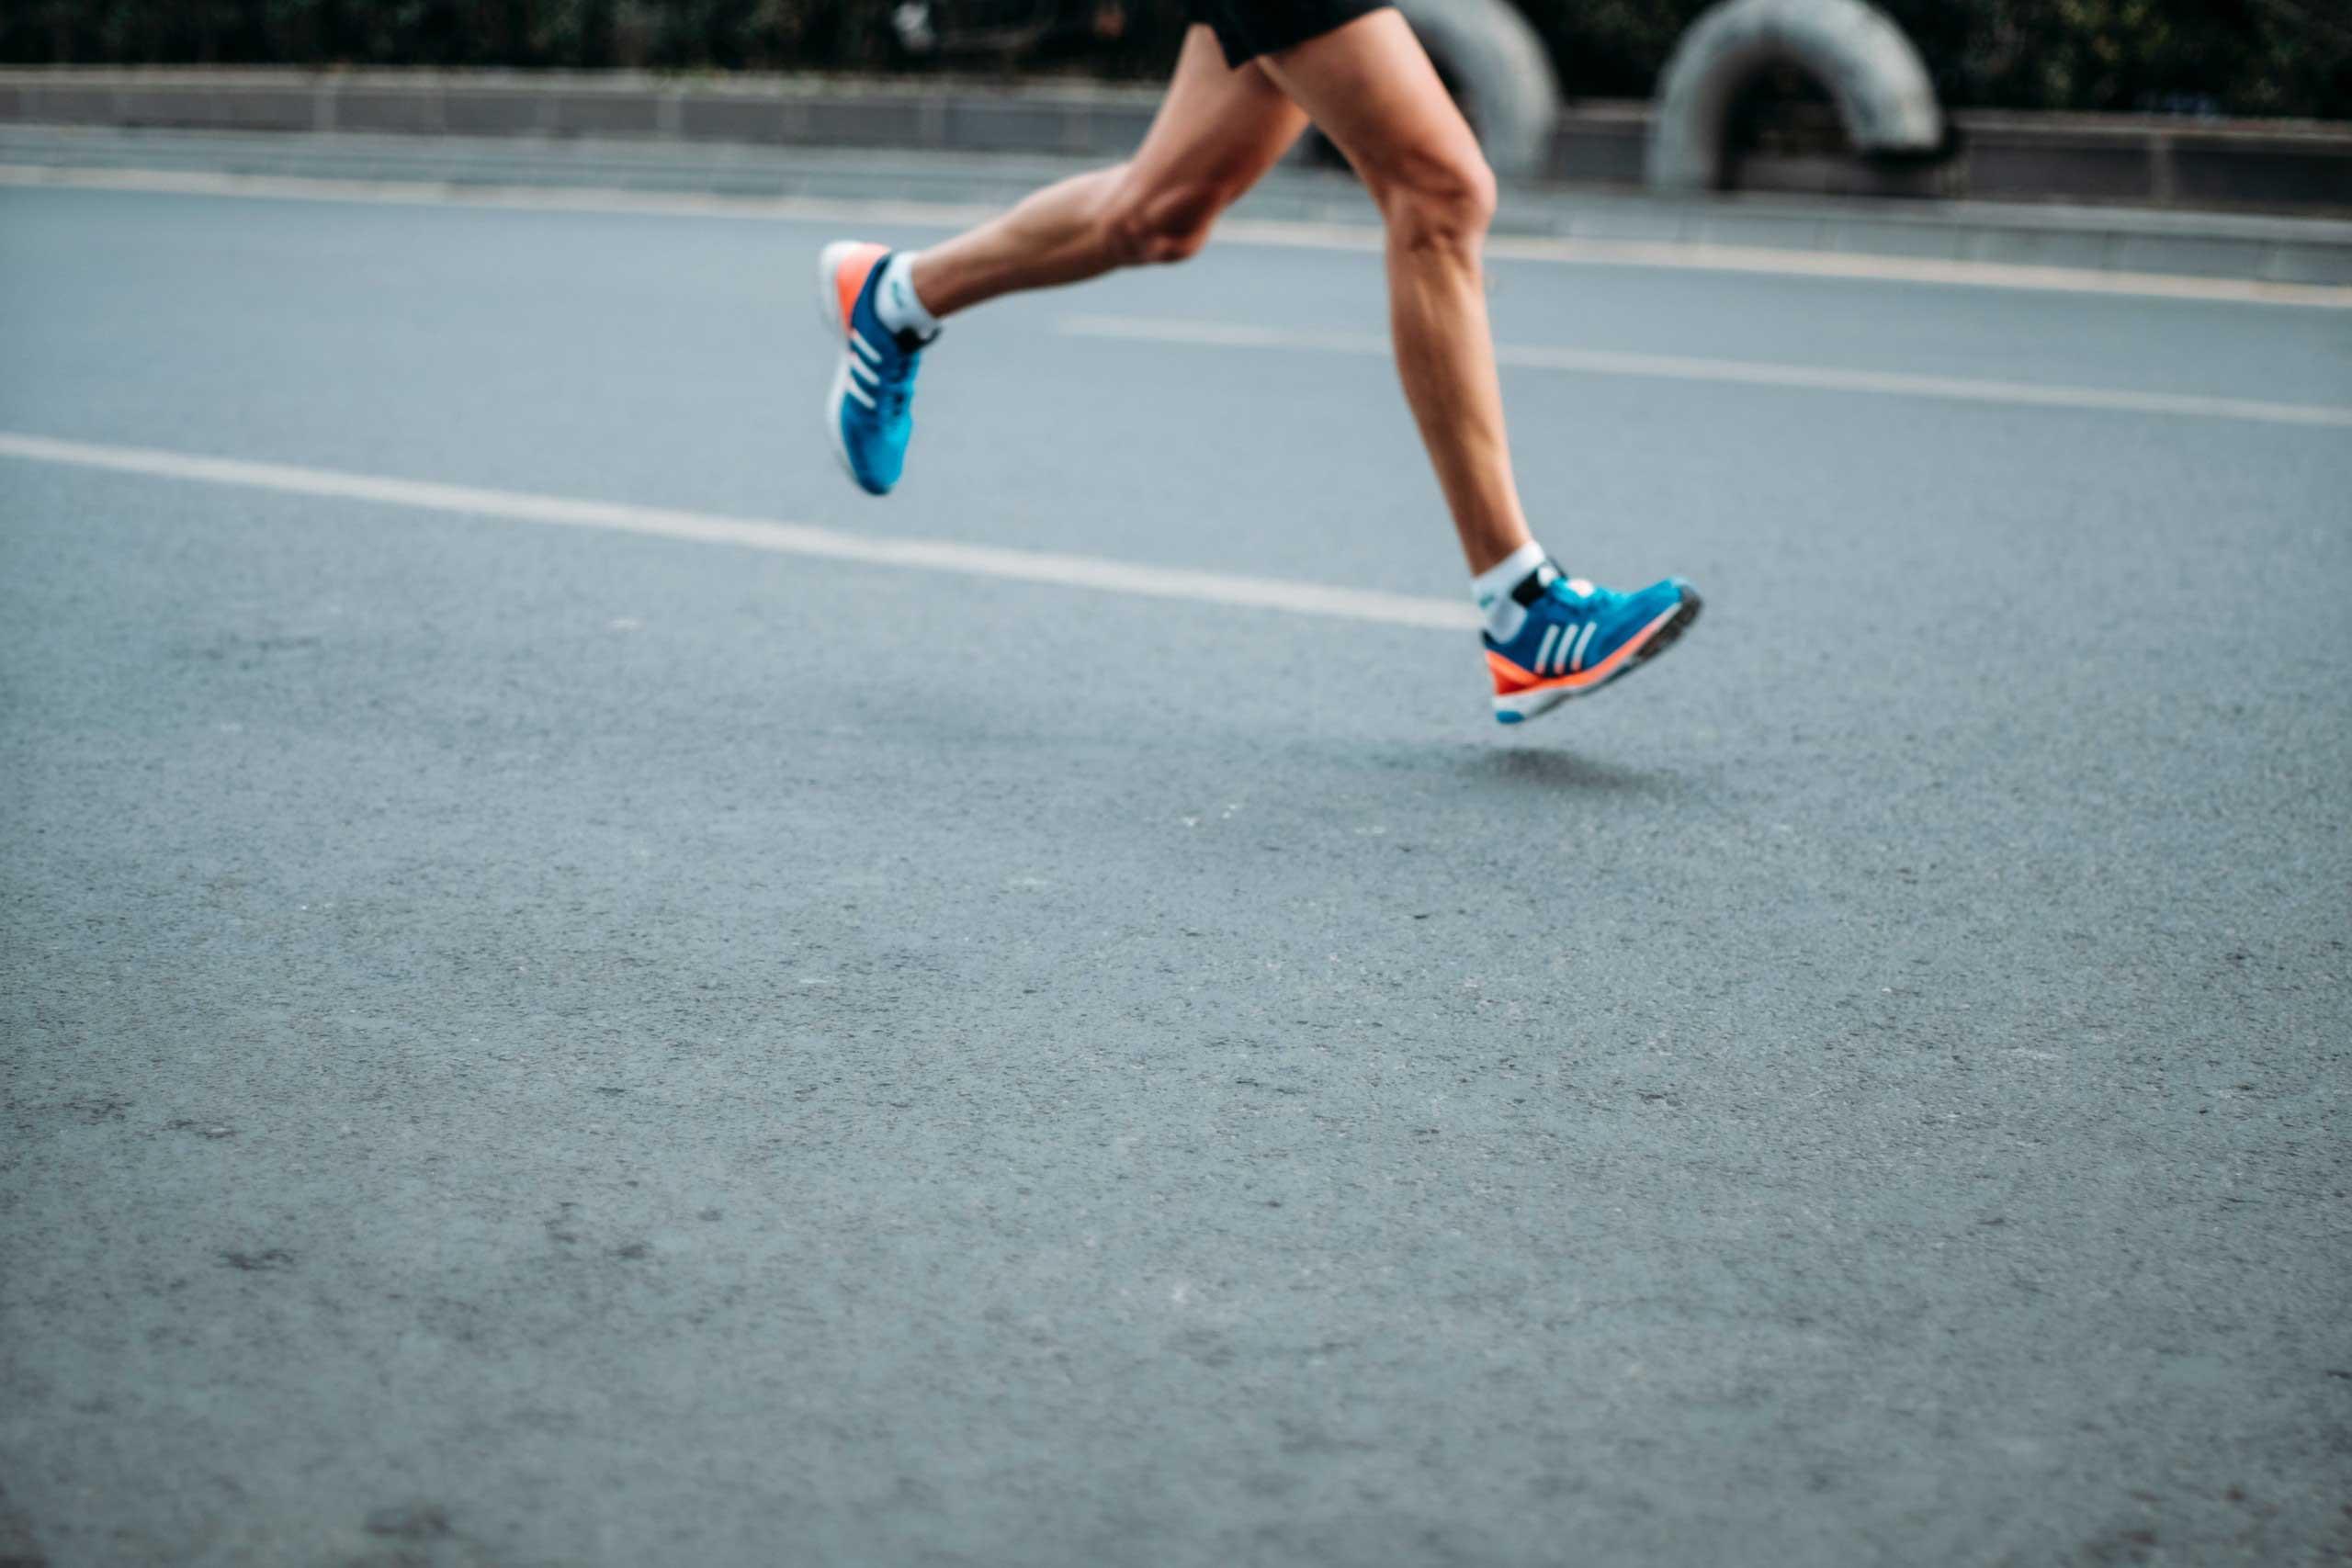 Man running on the roads